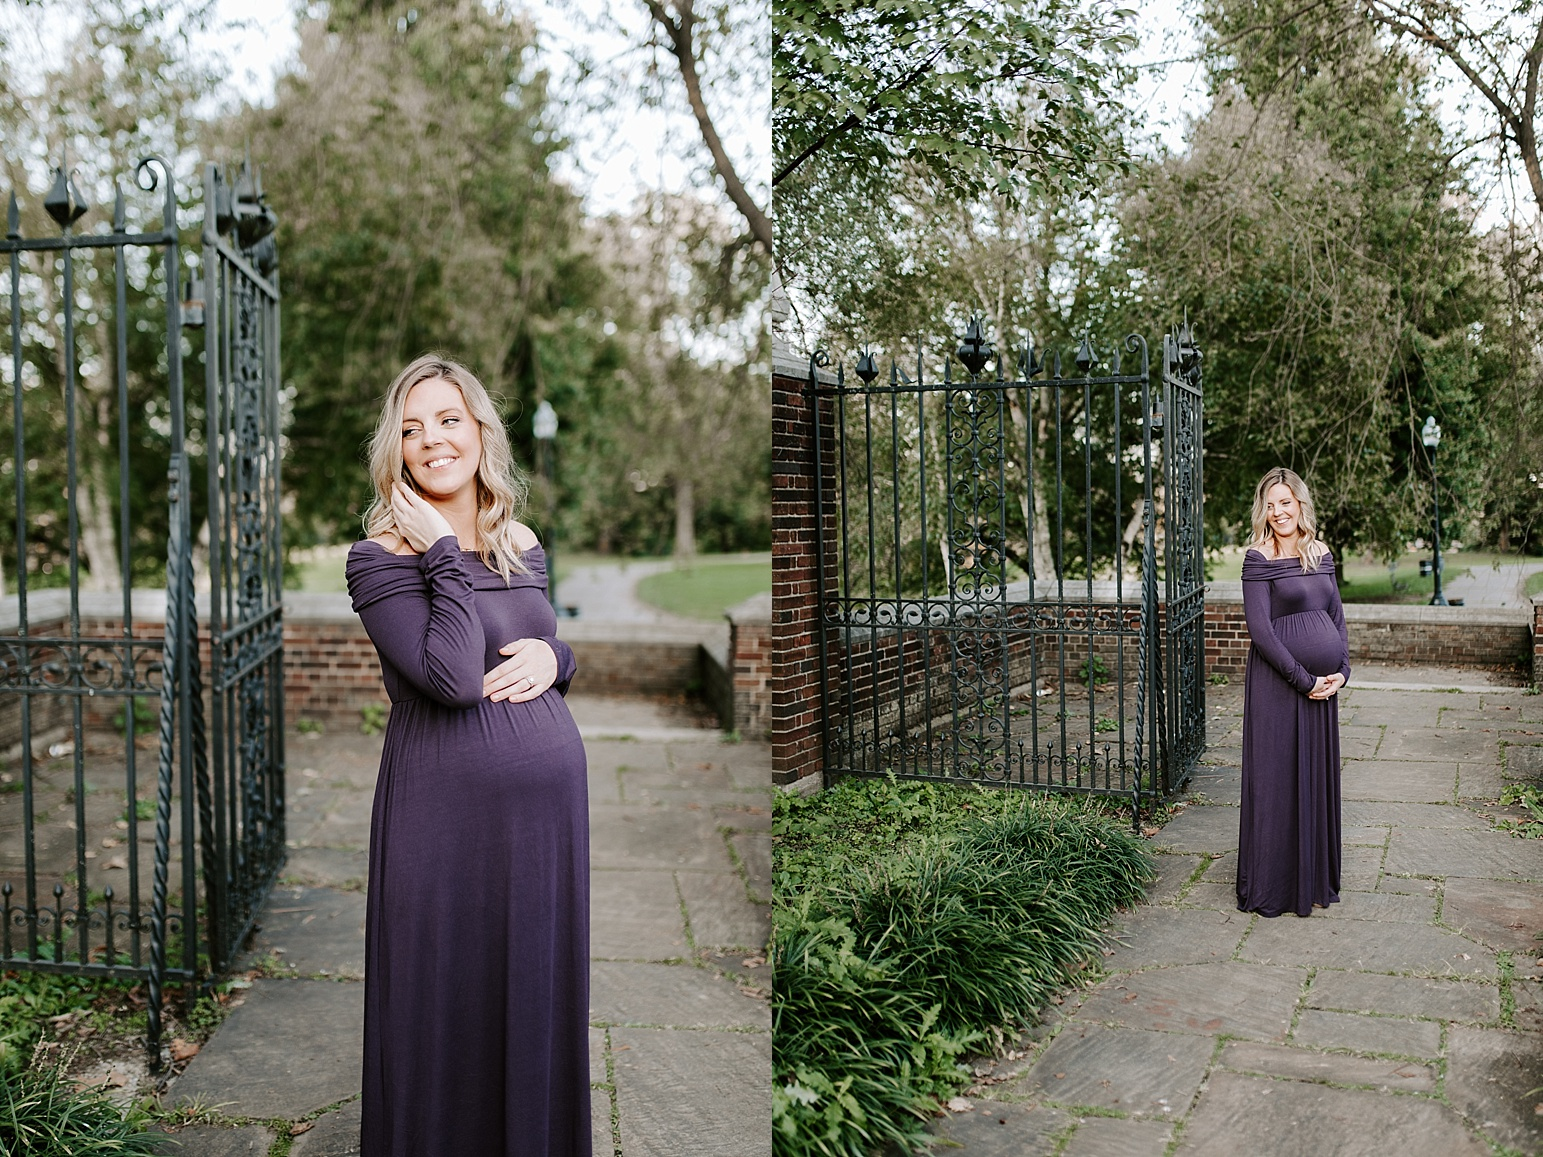 ashley_sara_photography-mellon-park-maternity-shoot-pittsburgh_photographer-maternity_photographer_pennsylvania12.jpg